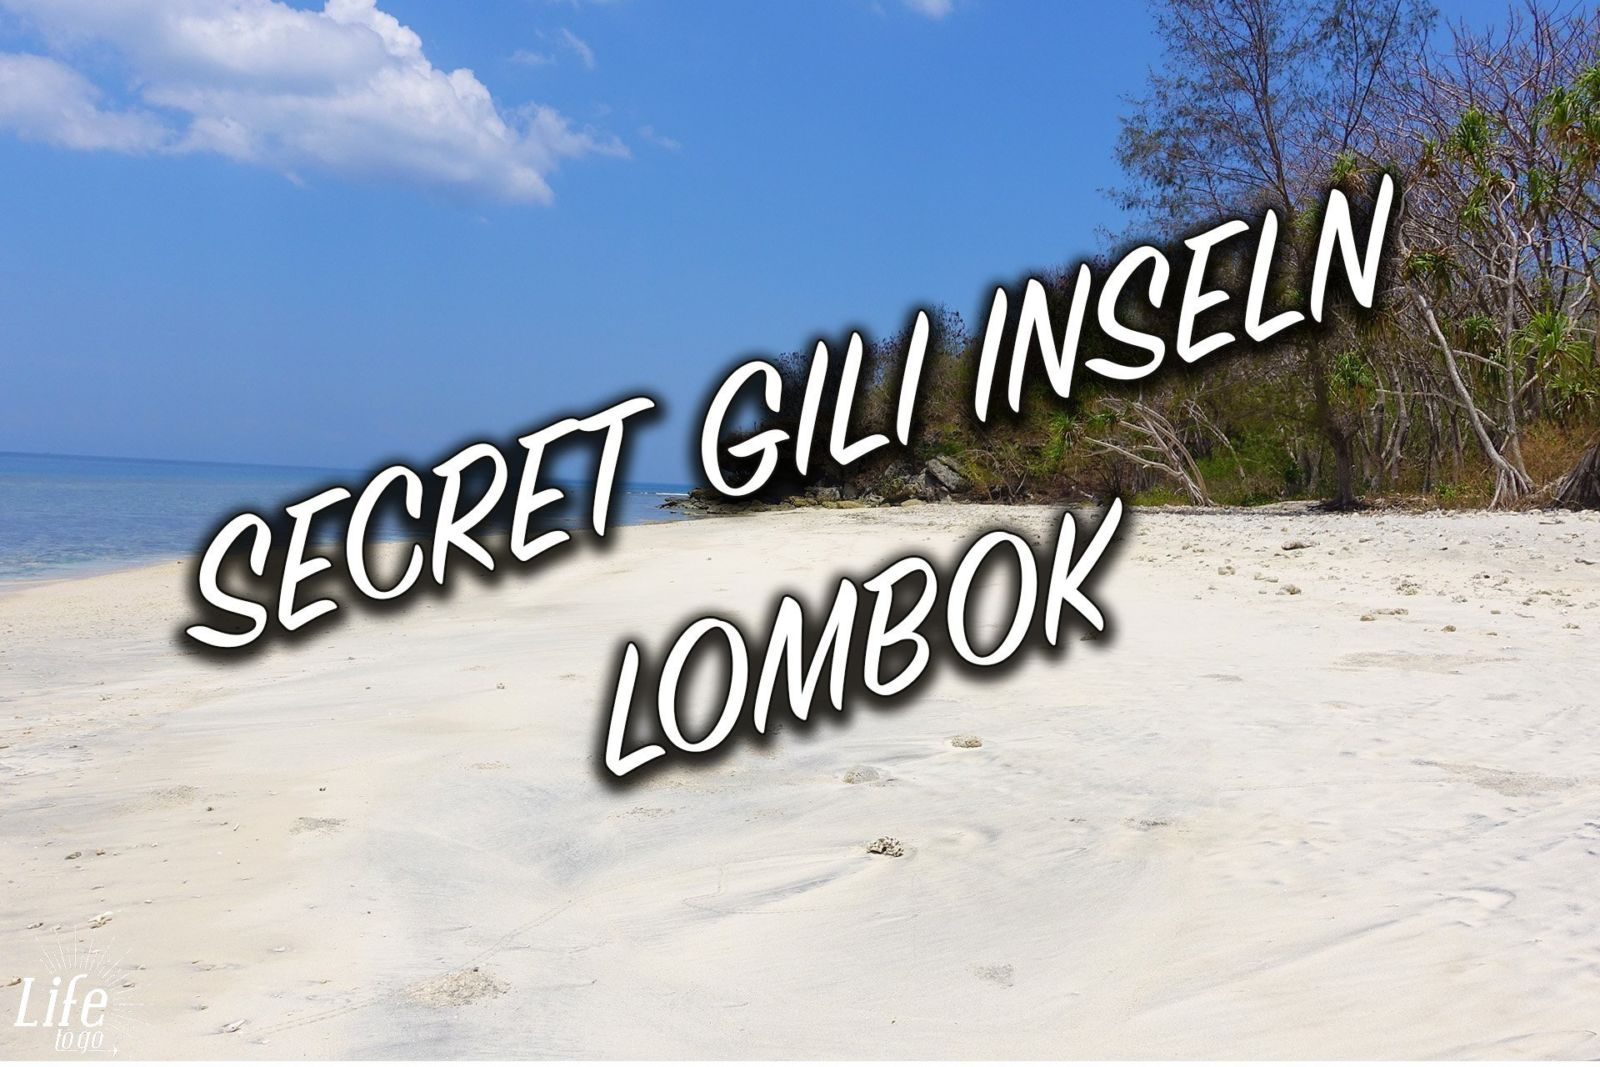 Die Secret Gilis - Trauminseln vor Lombok in Indonesien